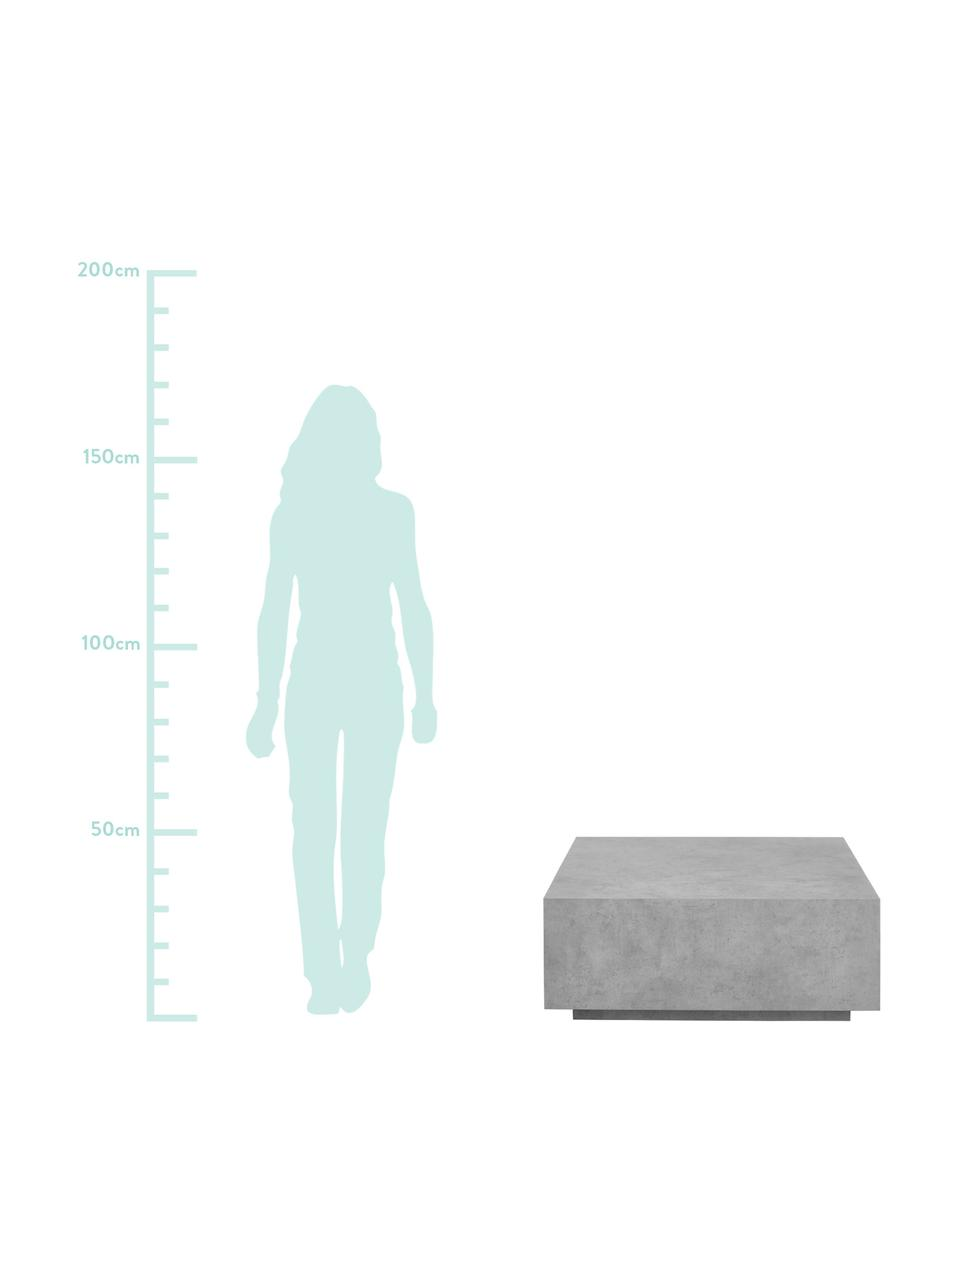 Zwevende salontafel Lesley in beton optiek, MDF bekleed met mmelaminefolie, massief mangohout, Grijs, betonkleurig, 90 x 35 cm